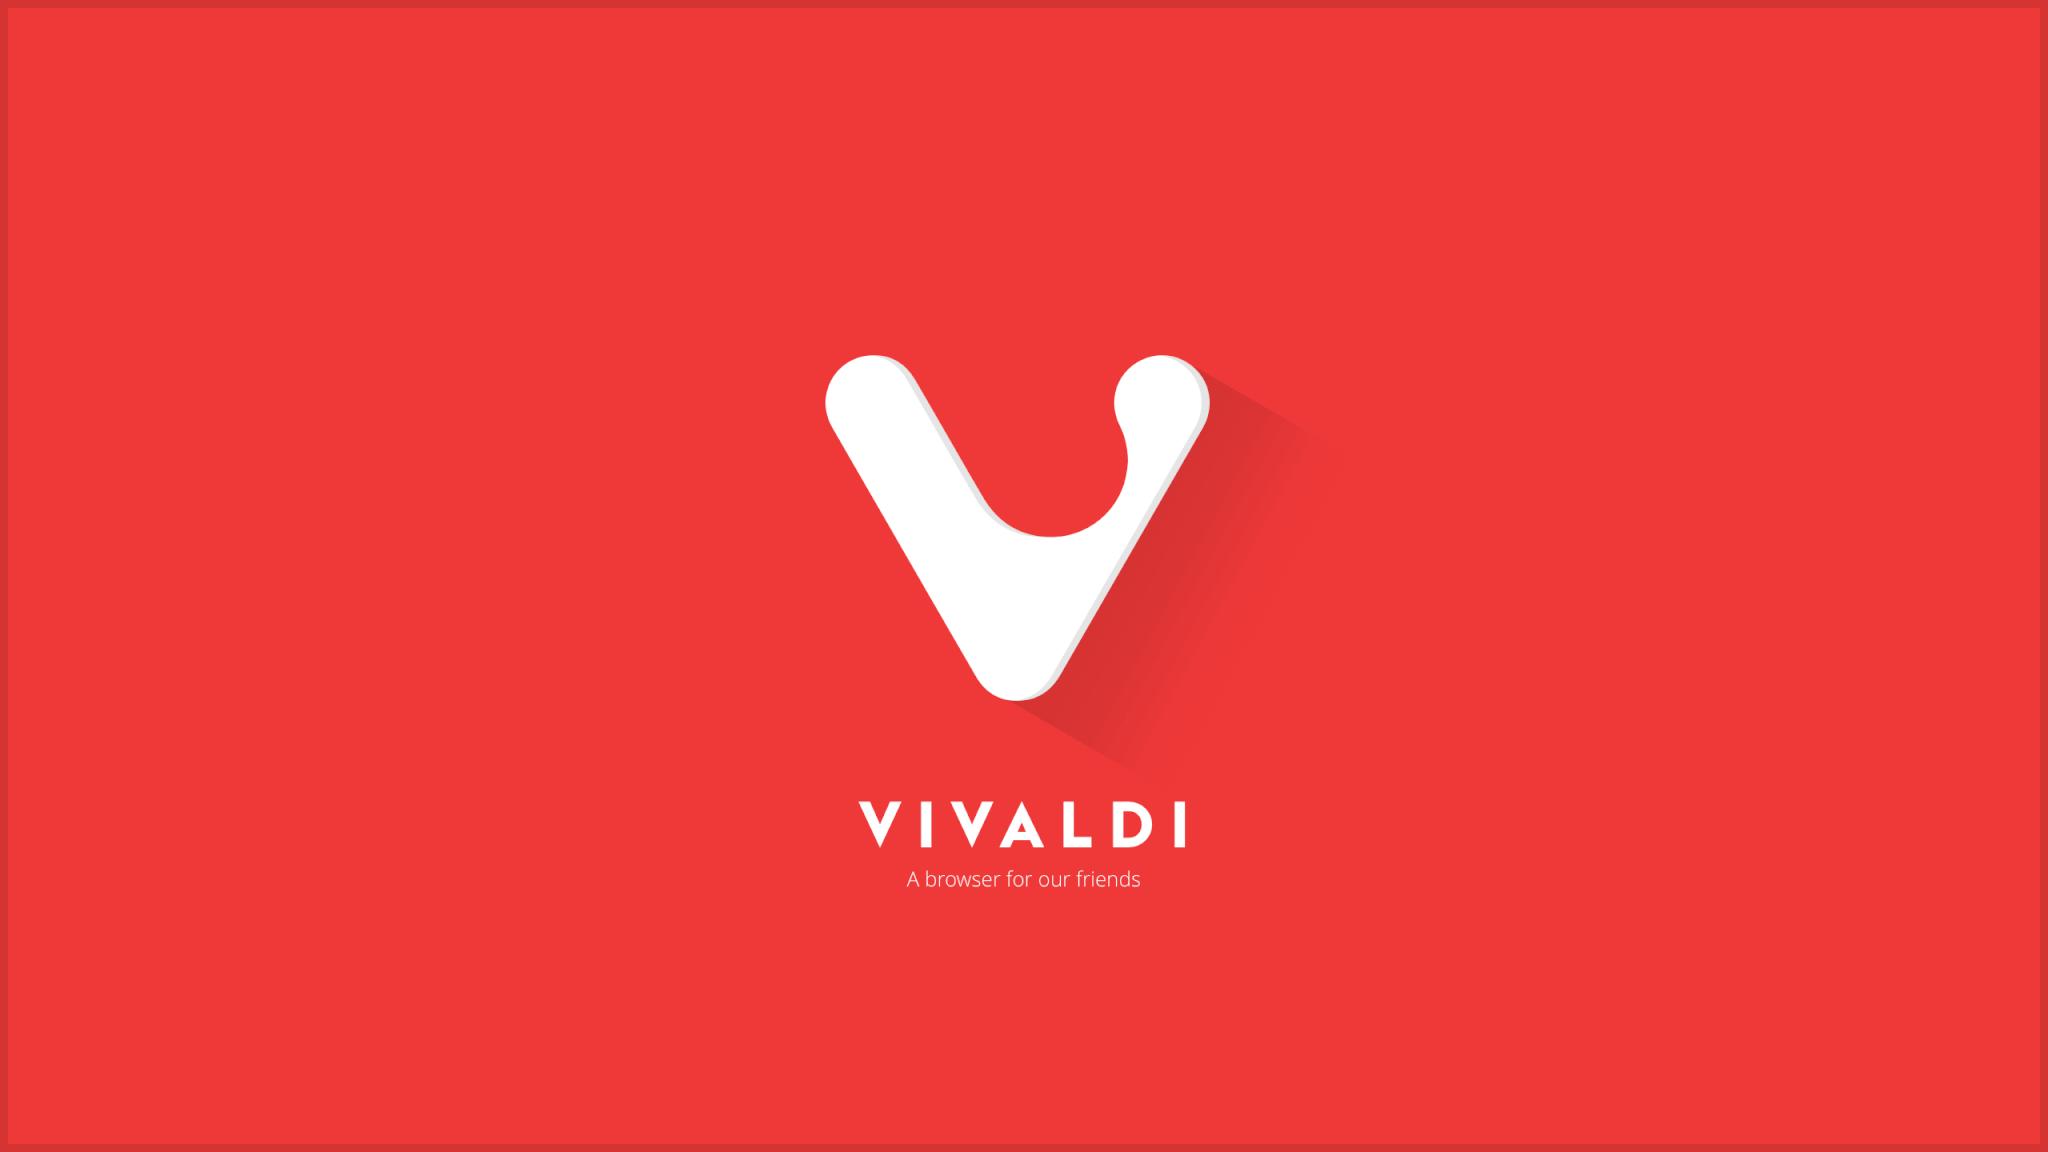 vivaldi_red